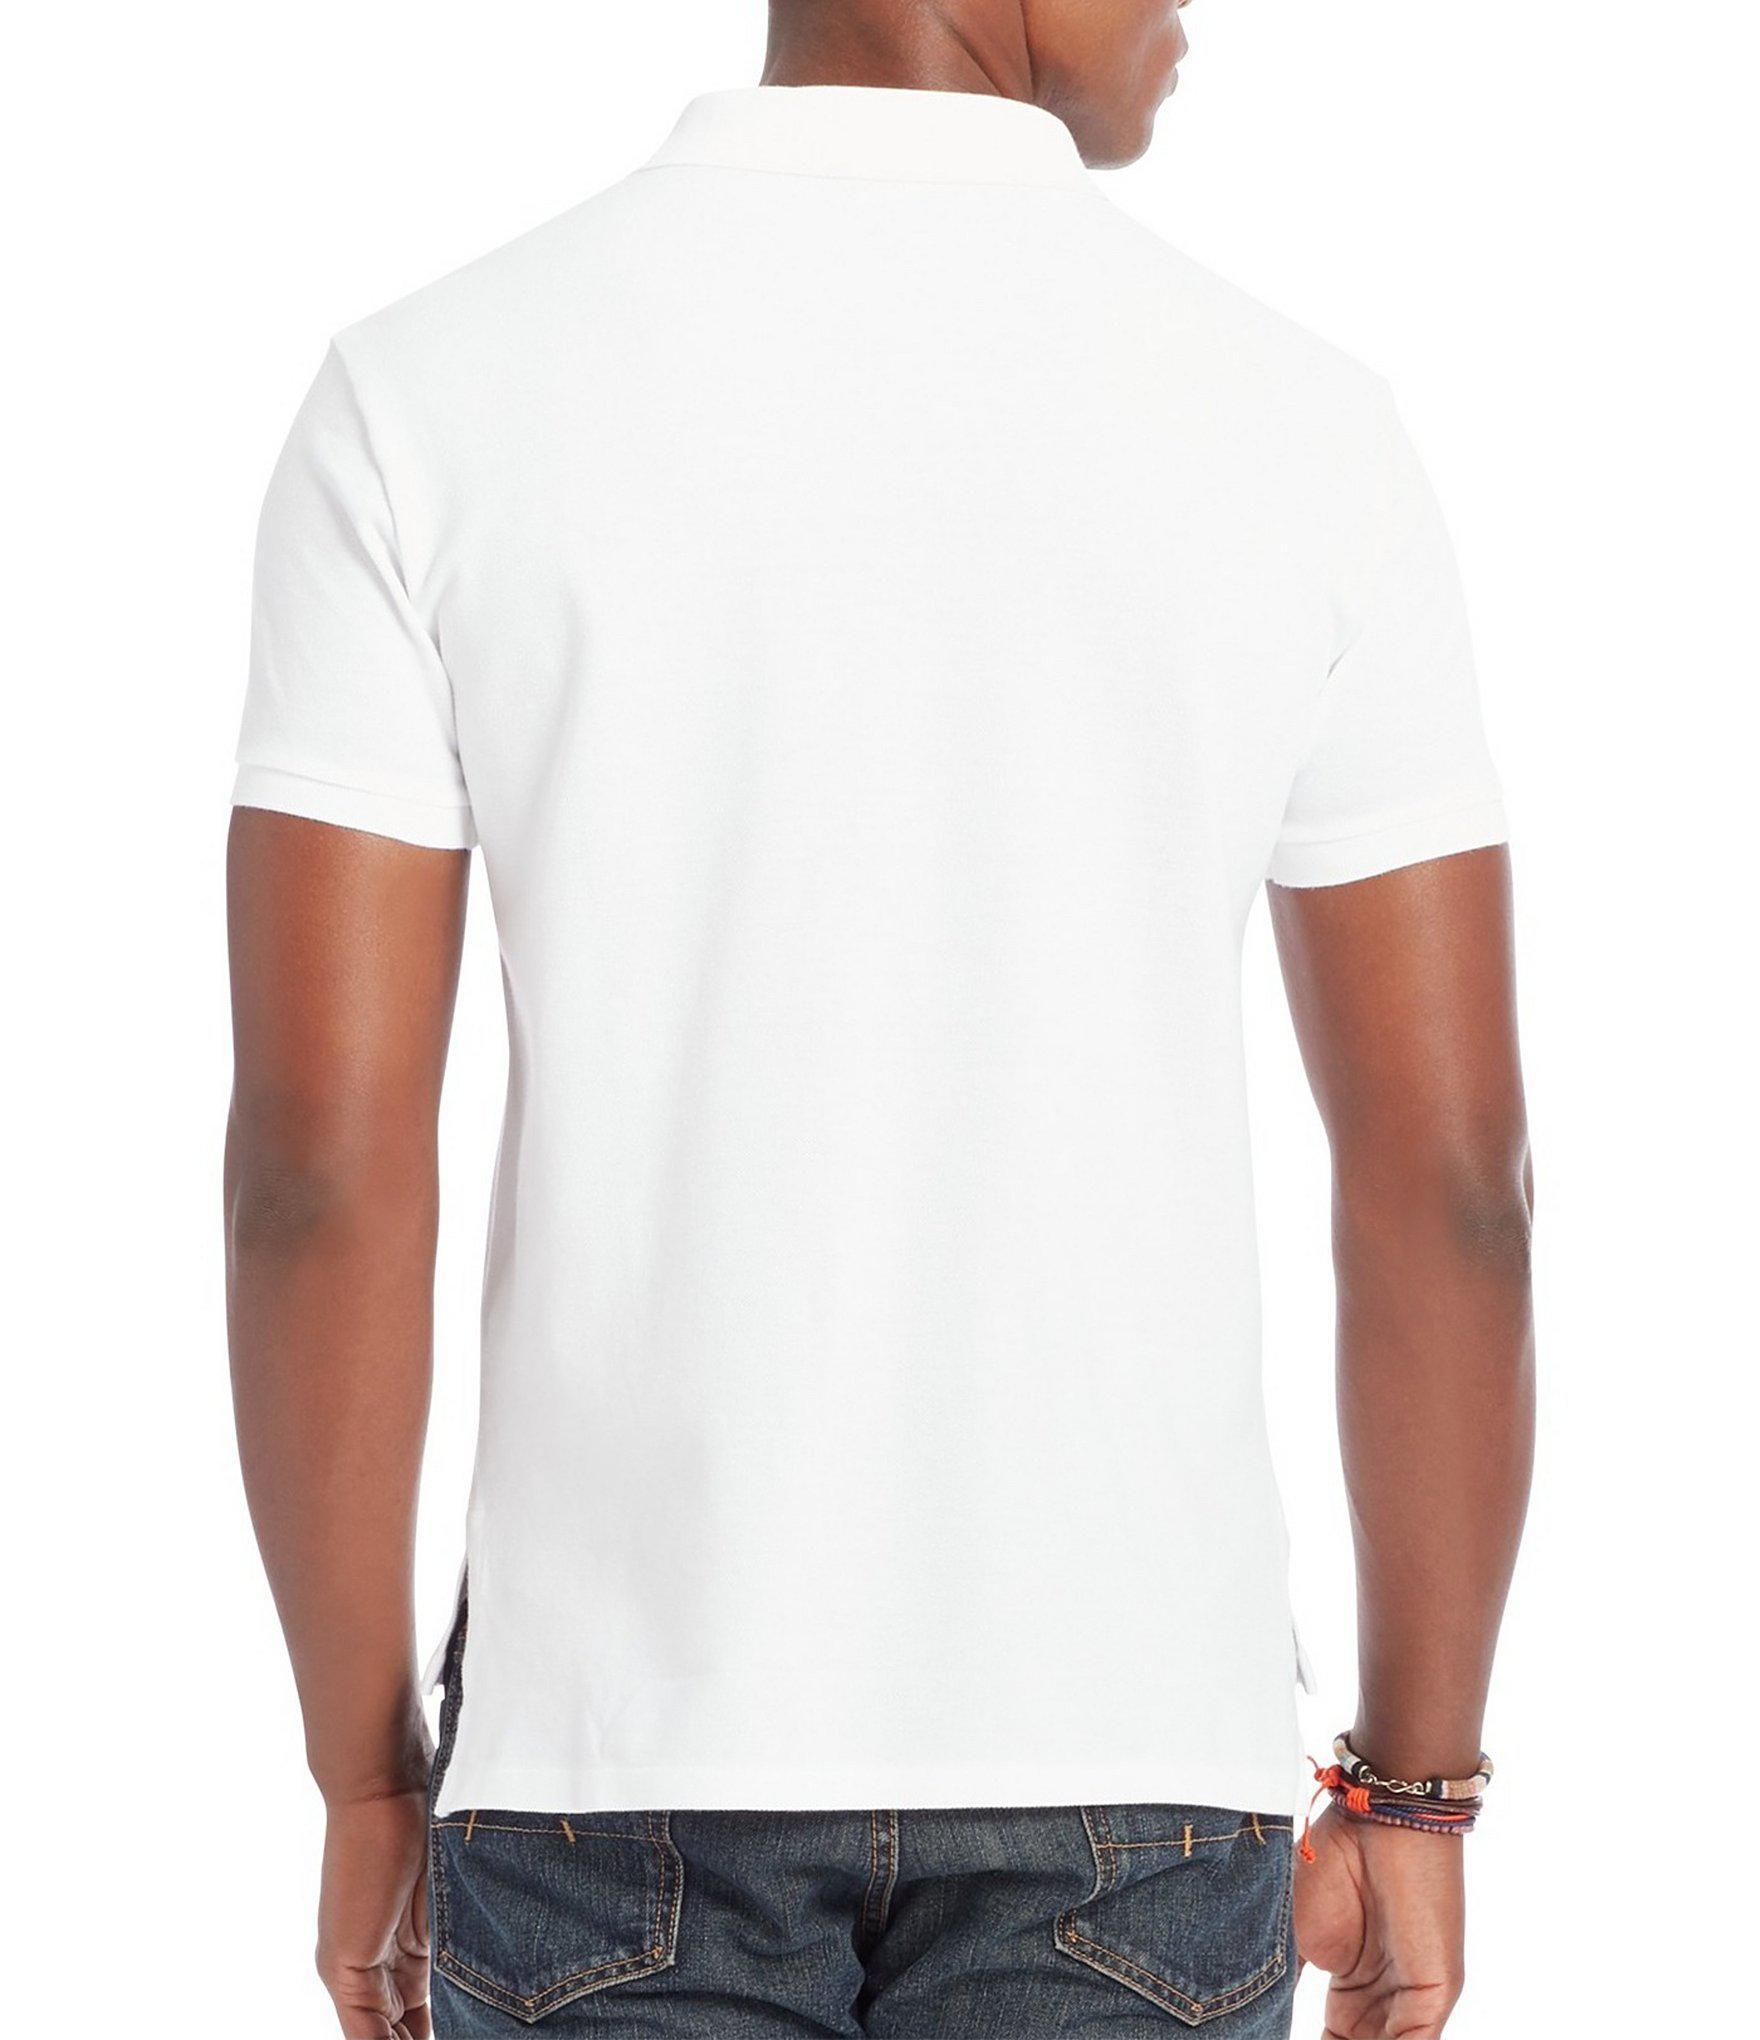 6a909743 Dillards Ralph Lauren Mens Polo Shirts – EDGE Engineering and ...